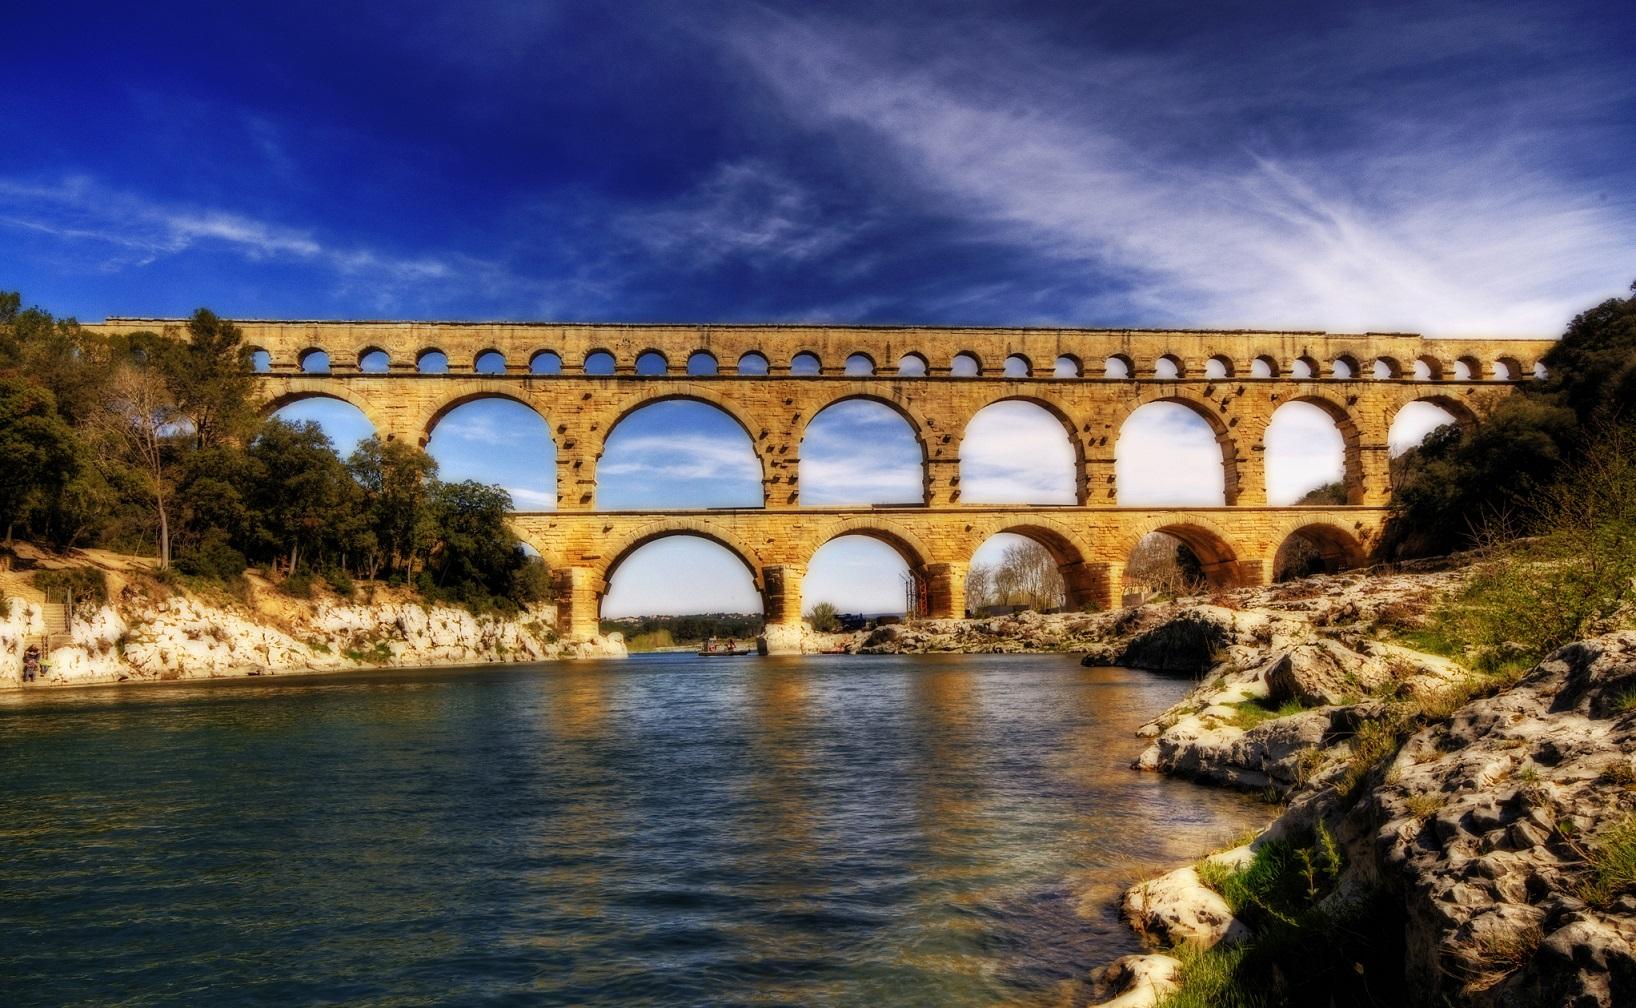 Roman aqueduct of Pont du Gard (Southern France)